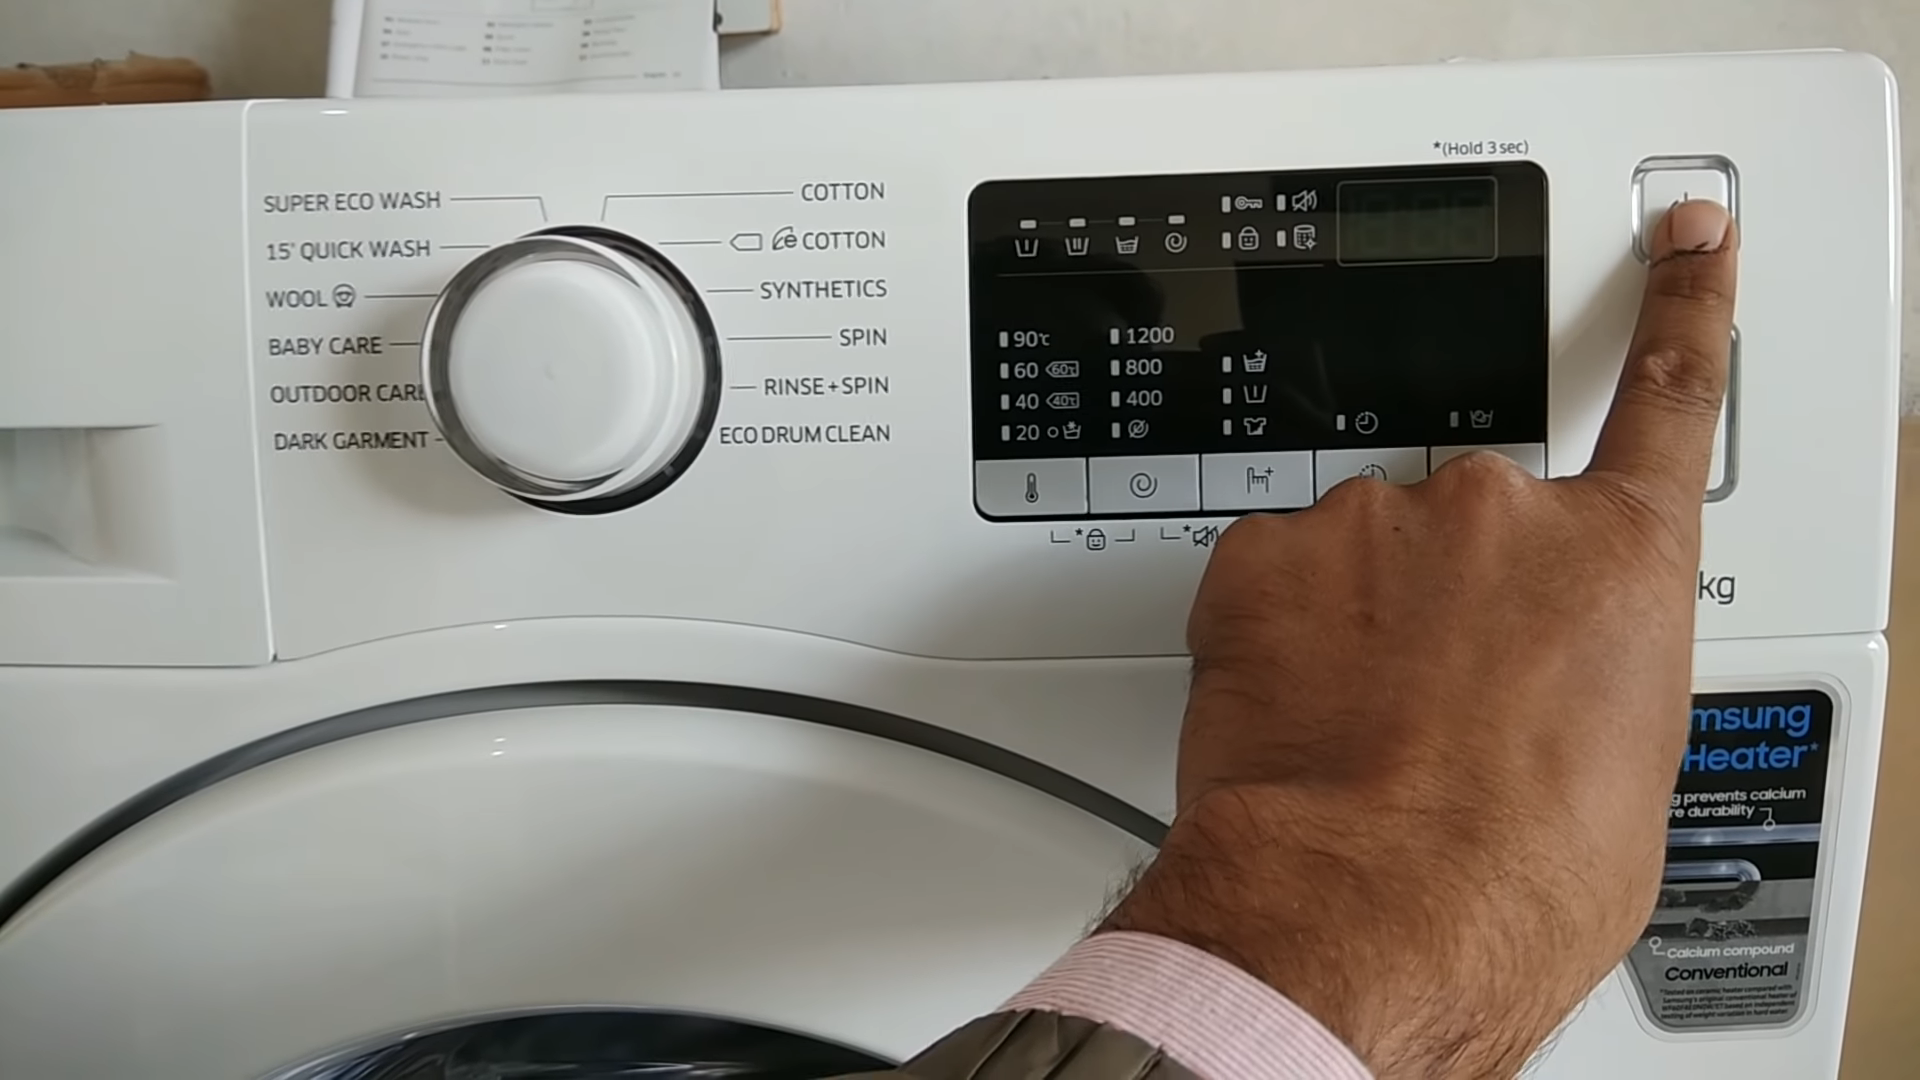 Washing Machine Squeals During Spin Cycle Overloading Washing Machine Washing Machine Lint Trap Home In 2020 Washing Machine Pan Washing Machine Washing Machine Hose